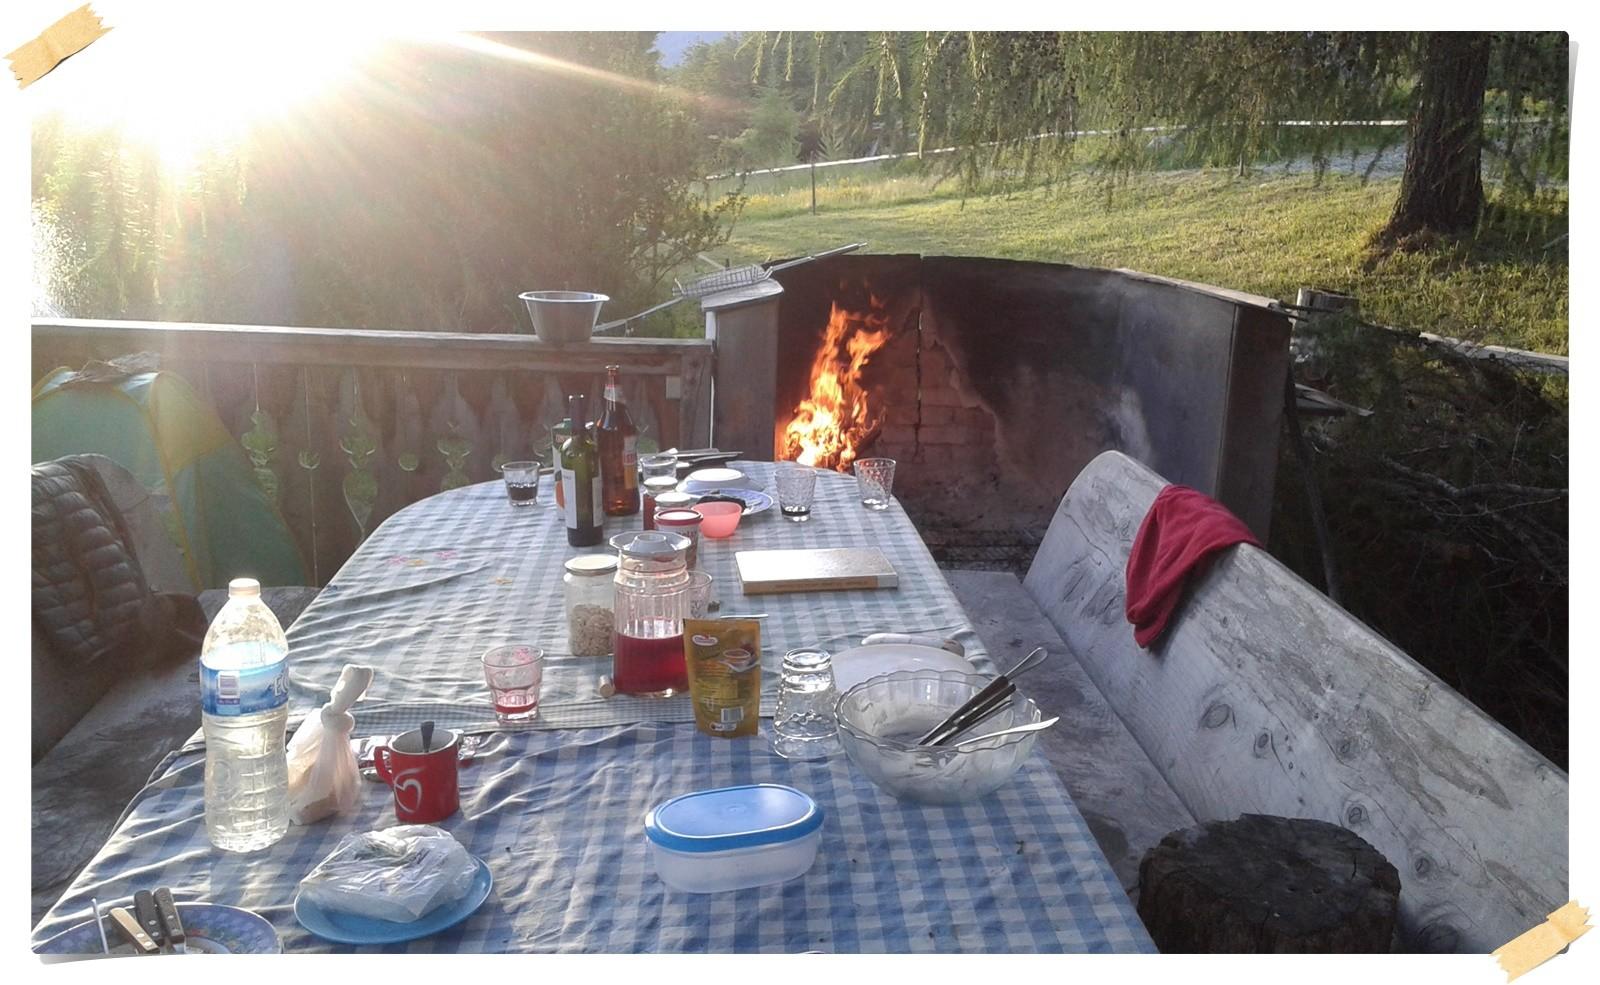 Am Abend am offenen Feuer